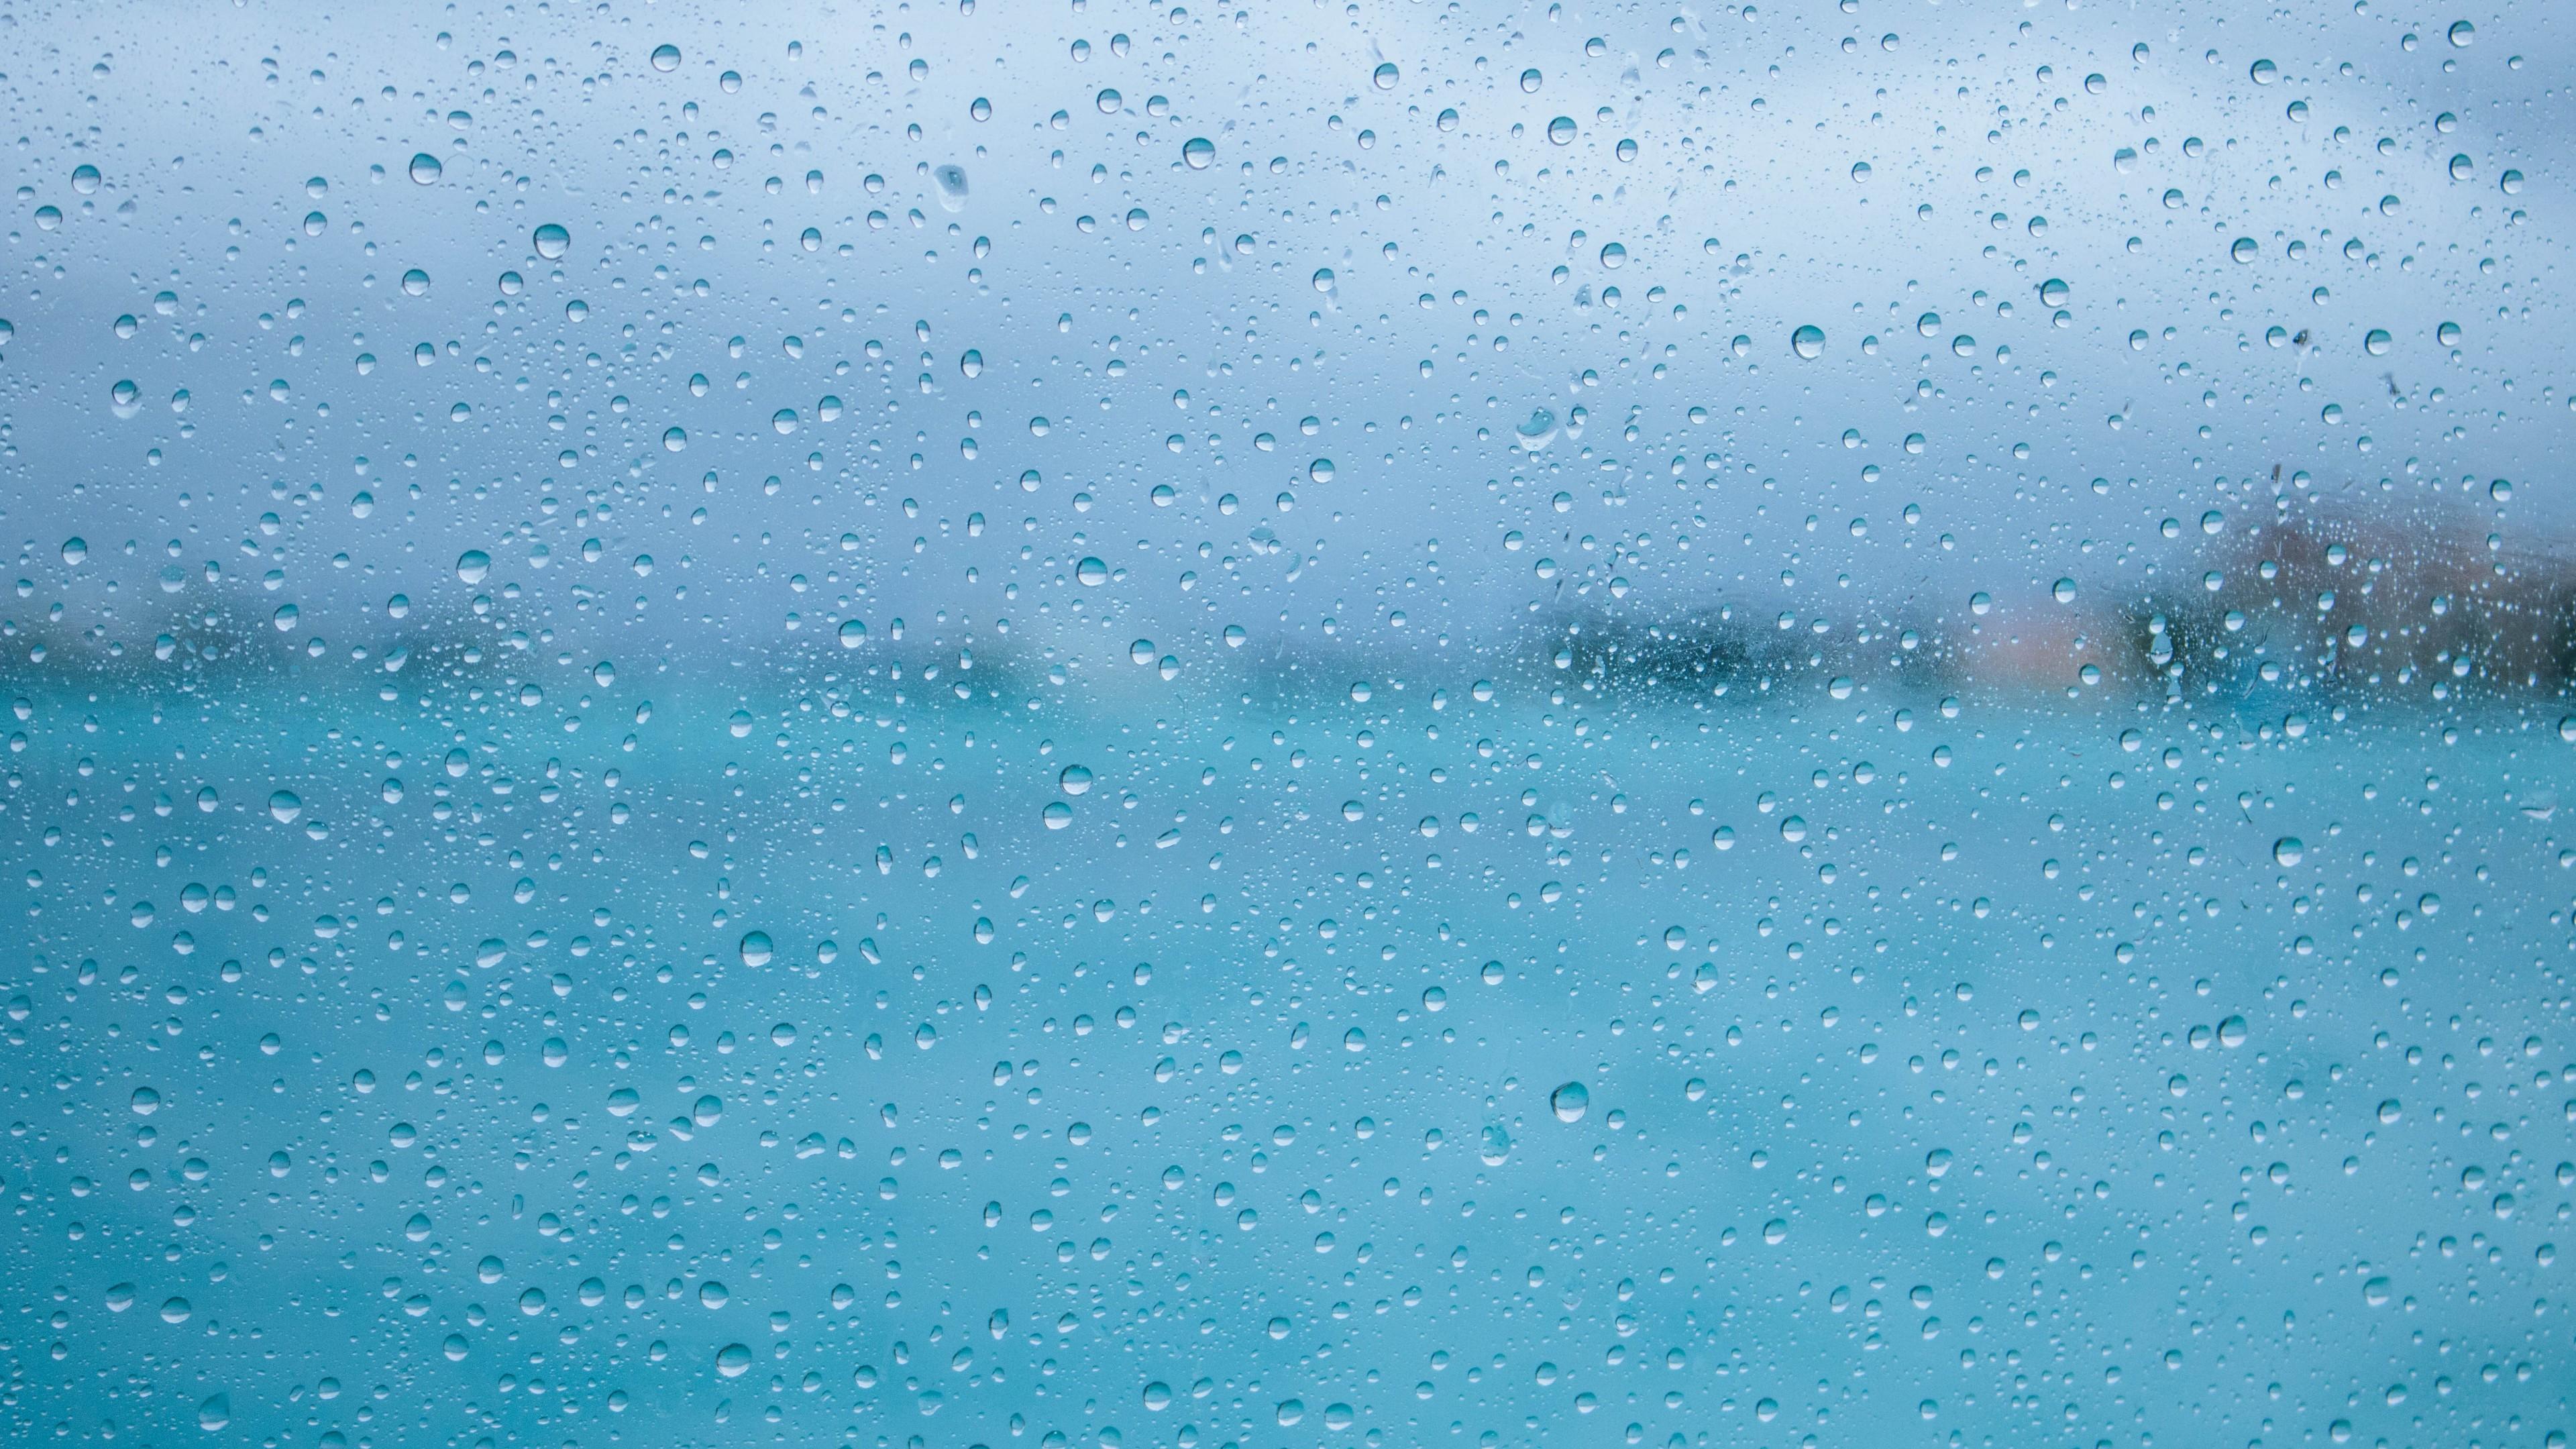 water droplets on glass 5k 1540132760 - Water Droplets On Glass 5k - nature wallpapers, hd-wallpapers, glass wallpapers, drops wallpapers, 5k wallpapers, 4k-wallpapers